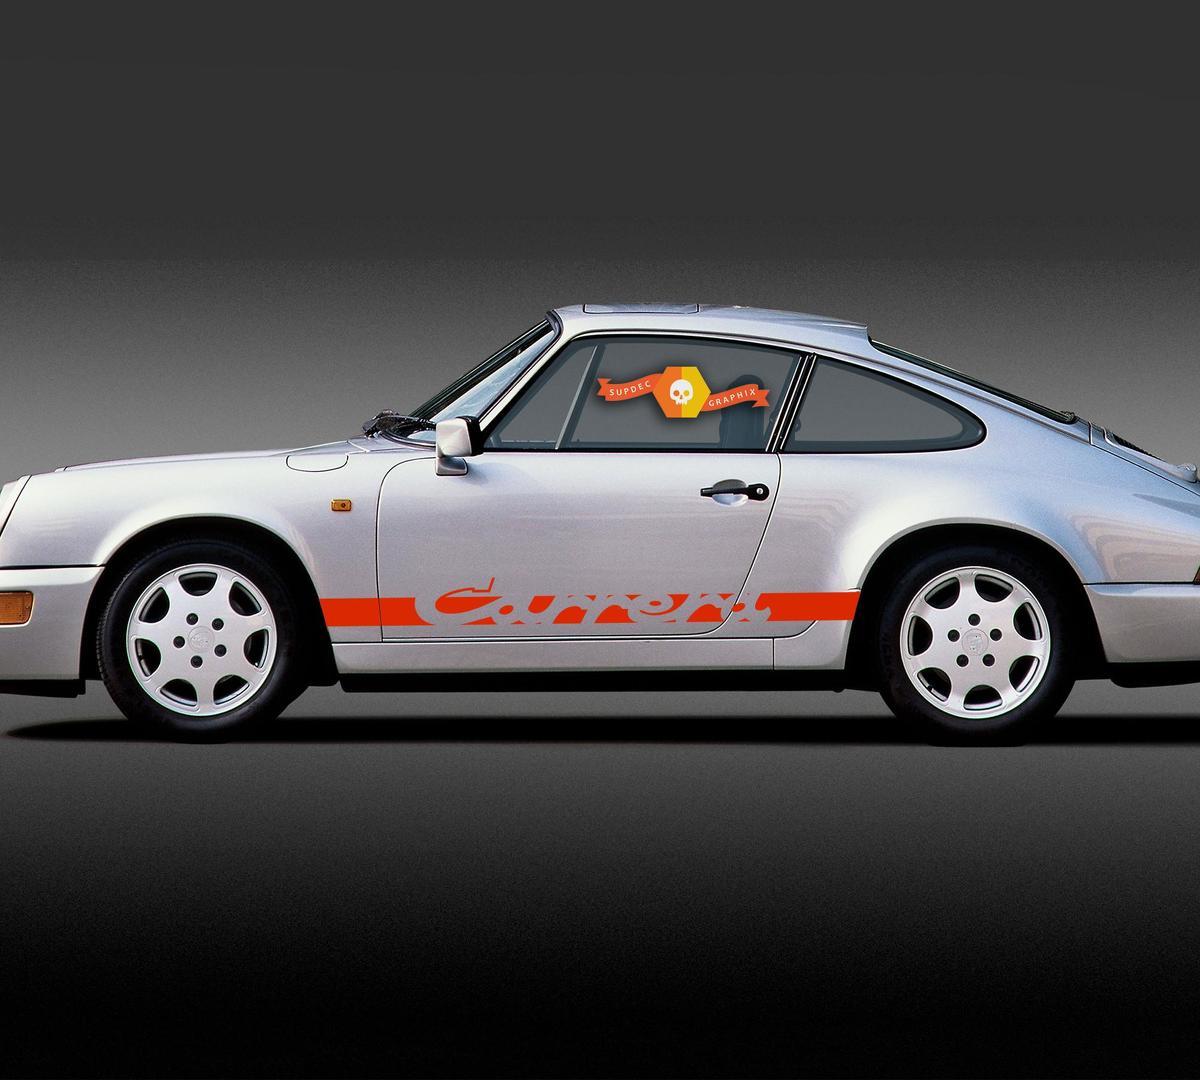 Porsche 911 Carrera Stripes Side Decal Sticker